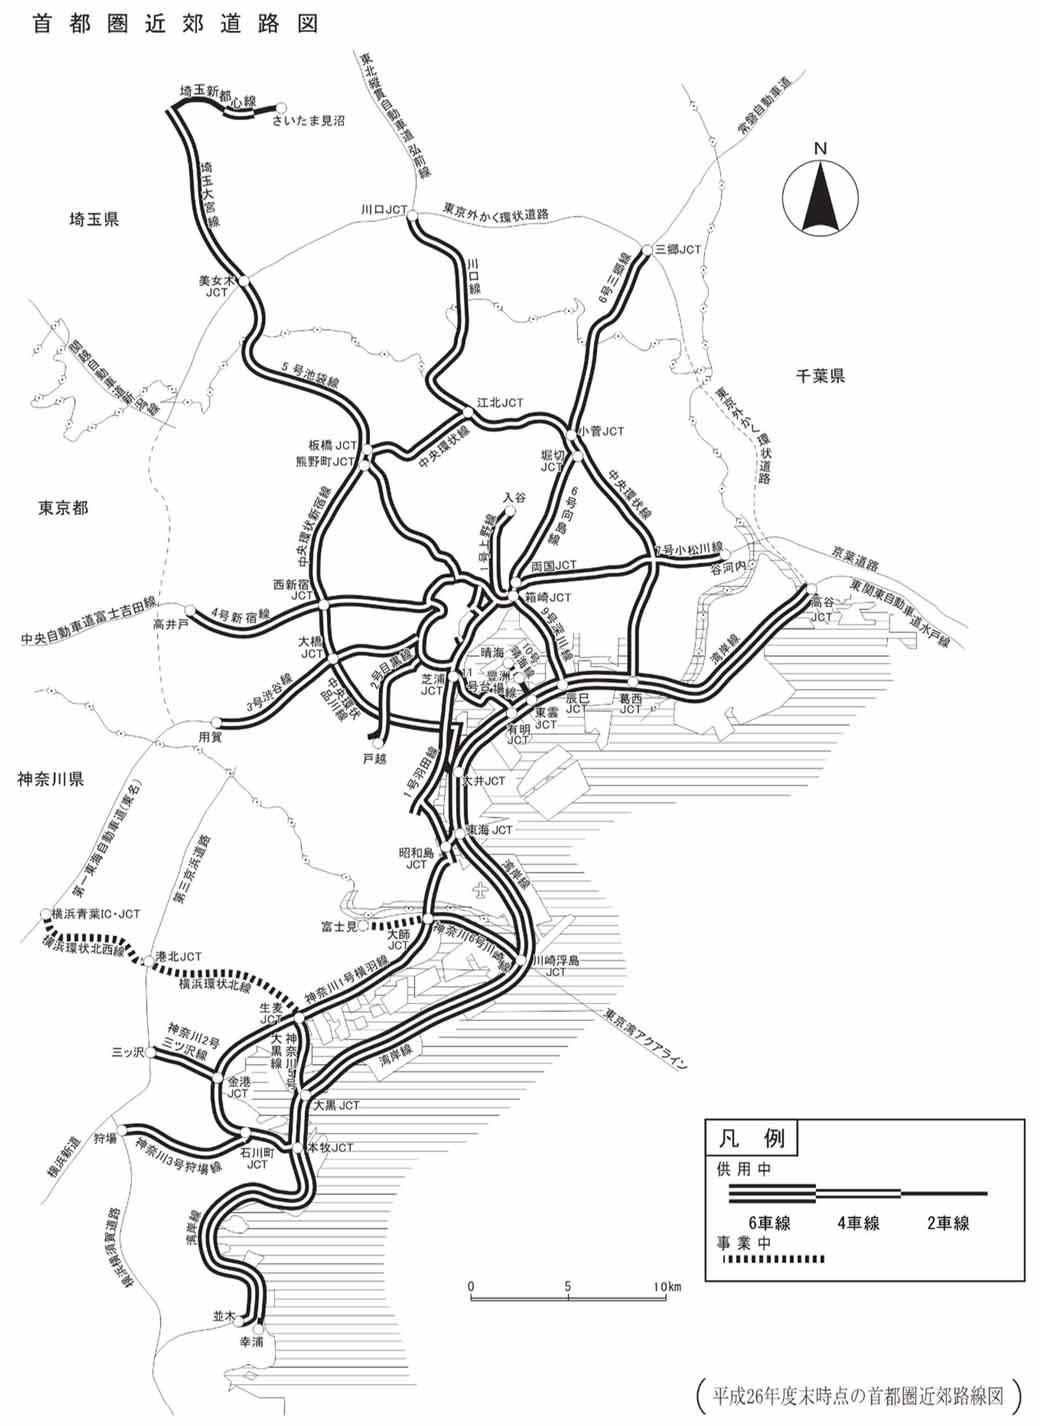 2015-version-of-the-tokyo-metropolitan-area-white-paper20150617-2-min